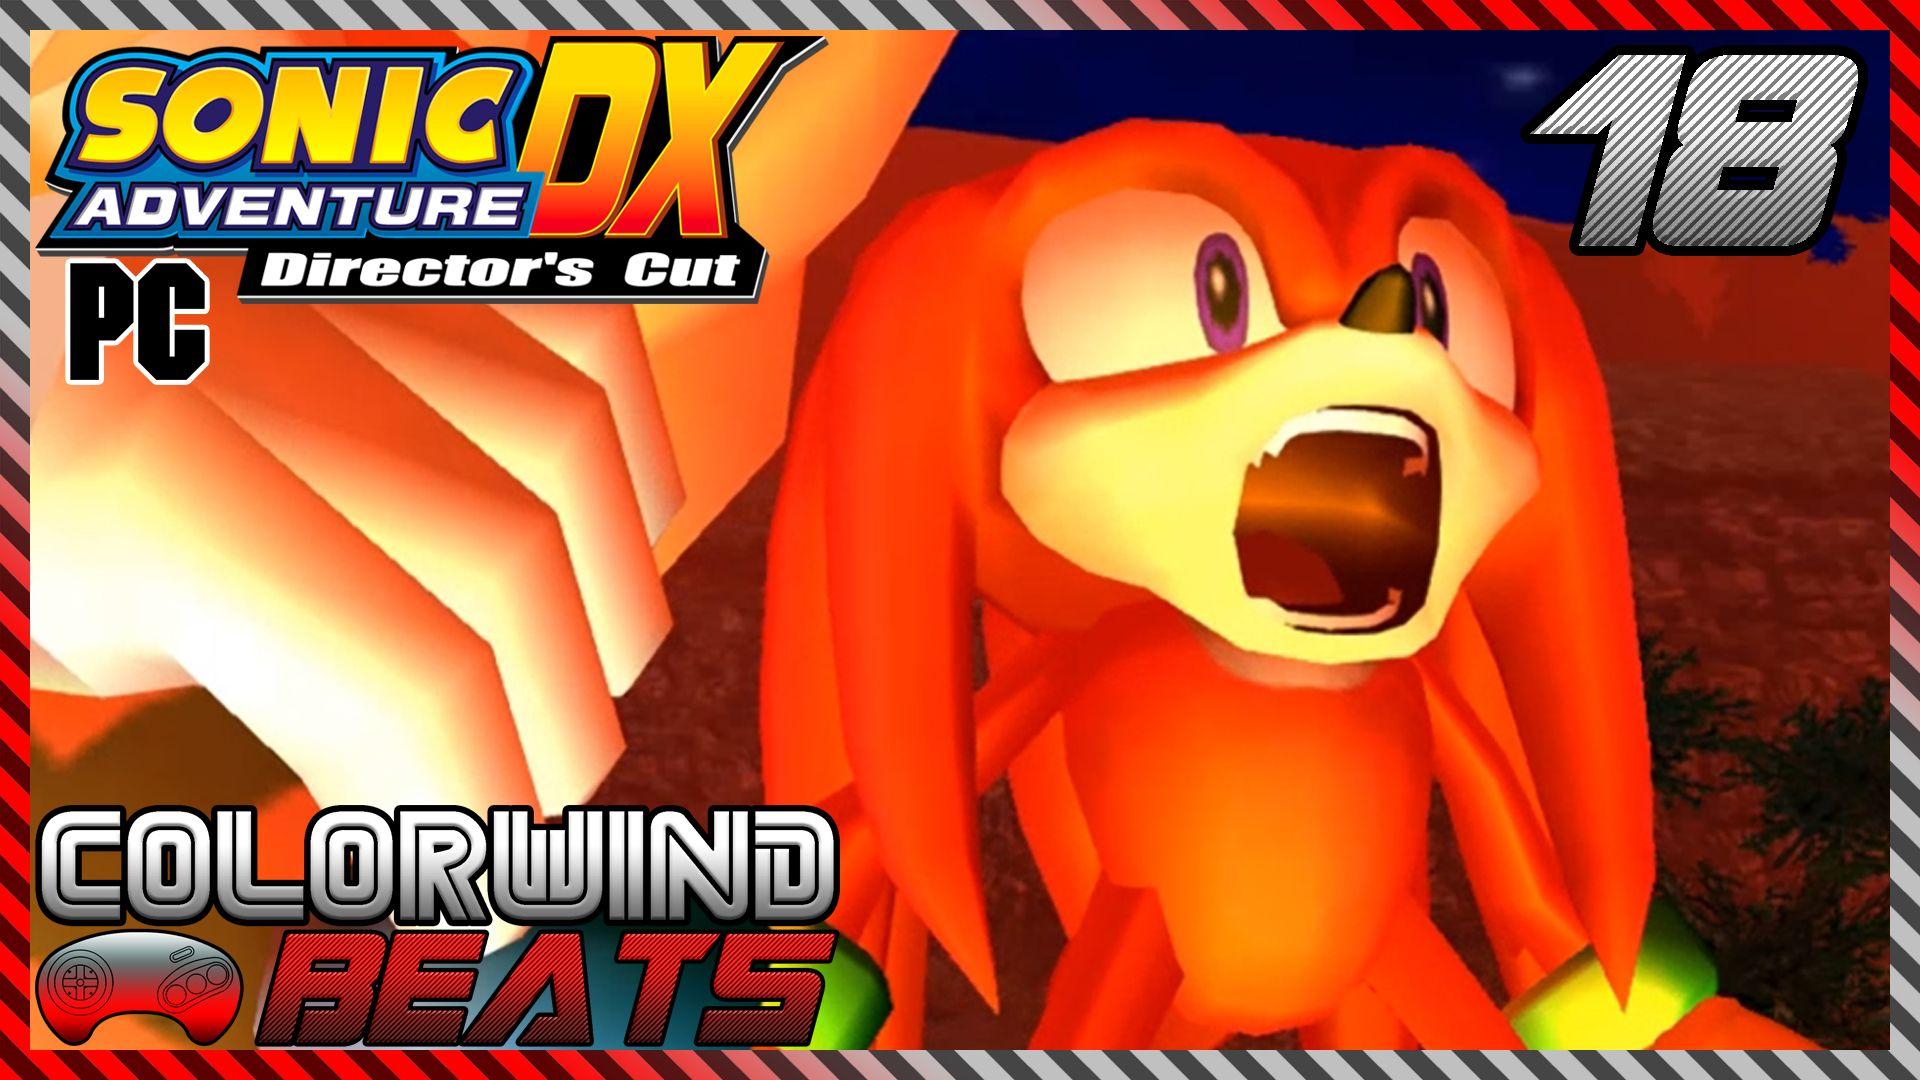 Sonic Adventure DX: Director's Cut (PC) #18